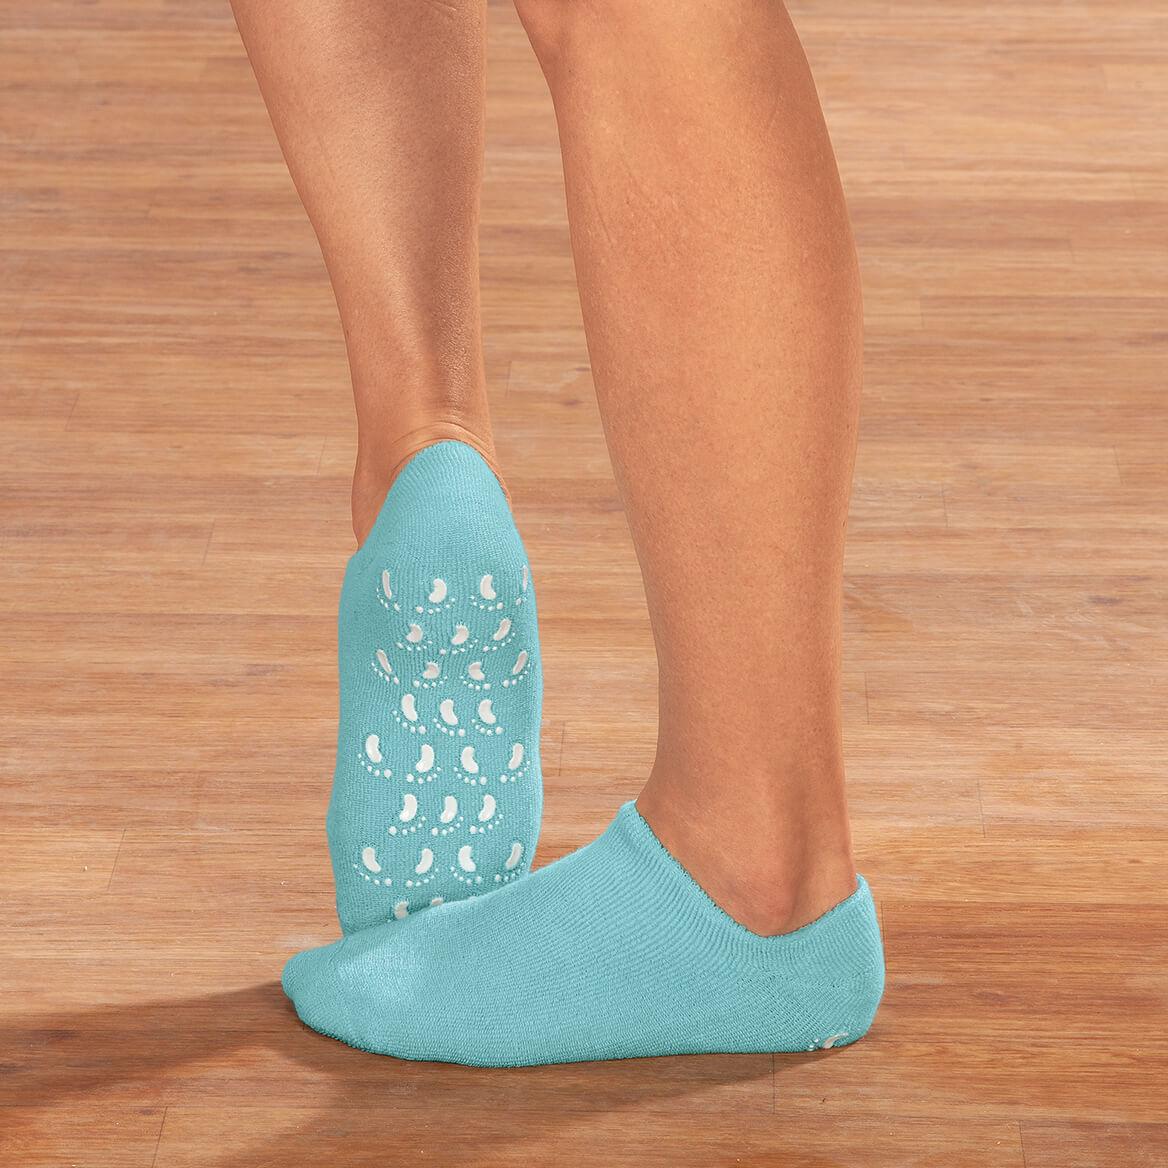 Moisturizing Gel Gripper Socks-368762